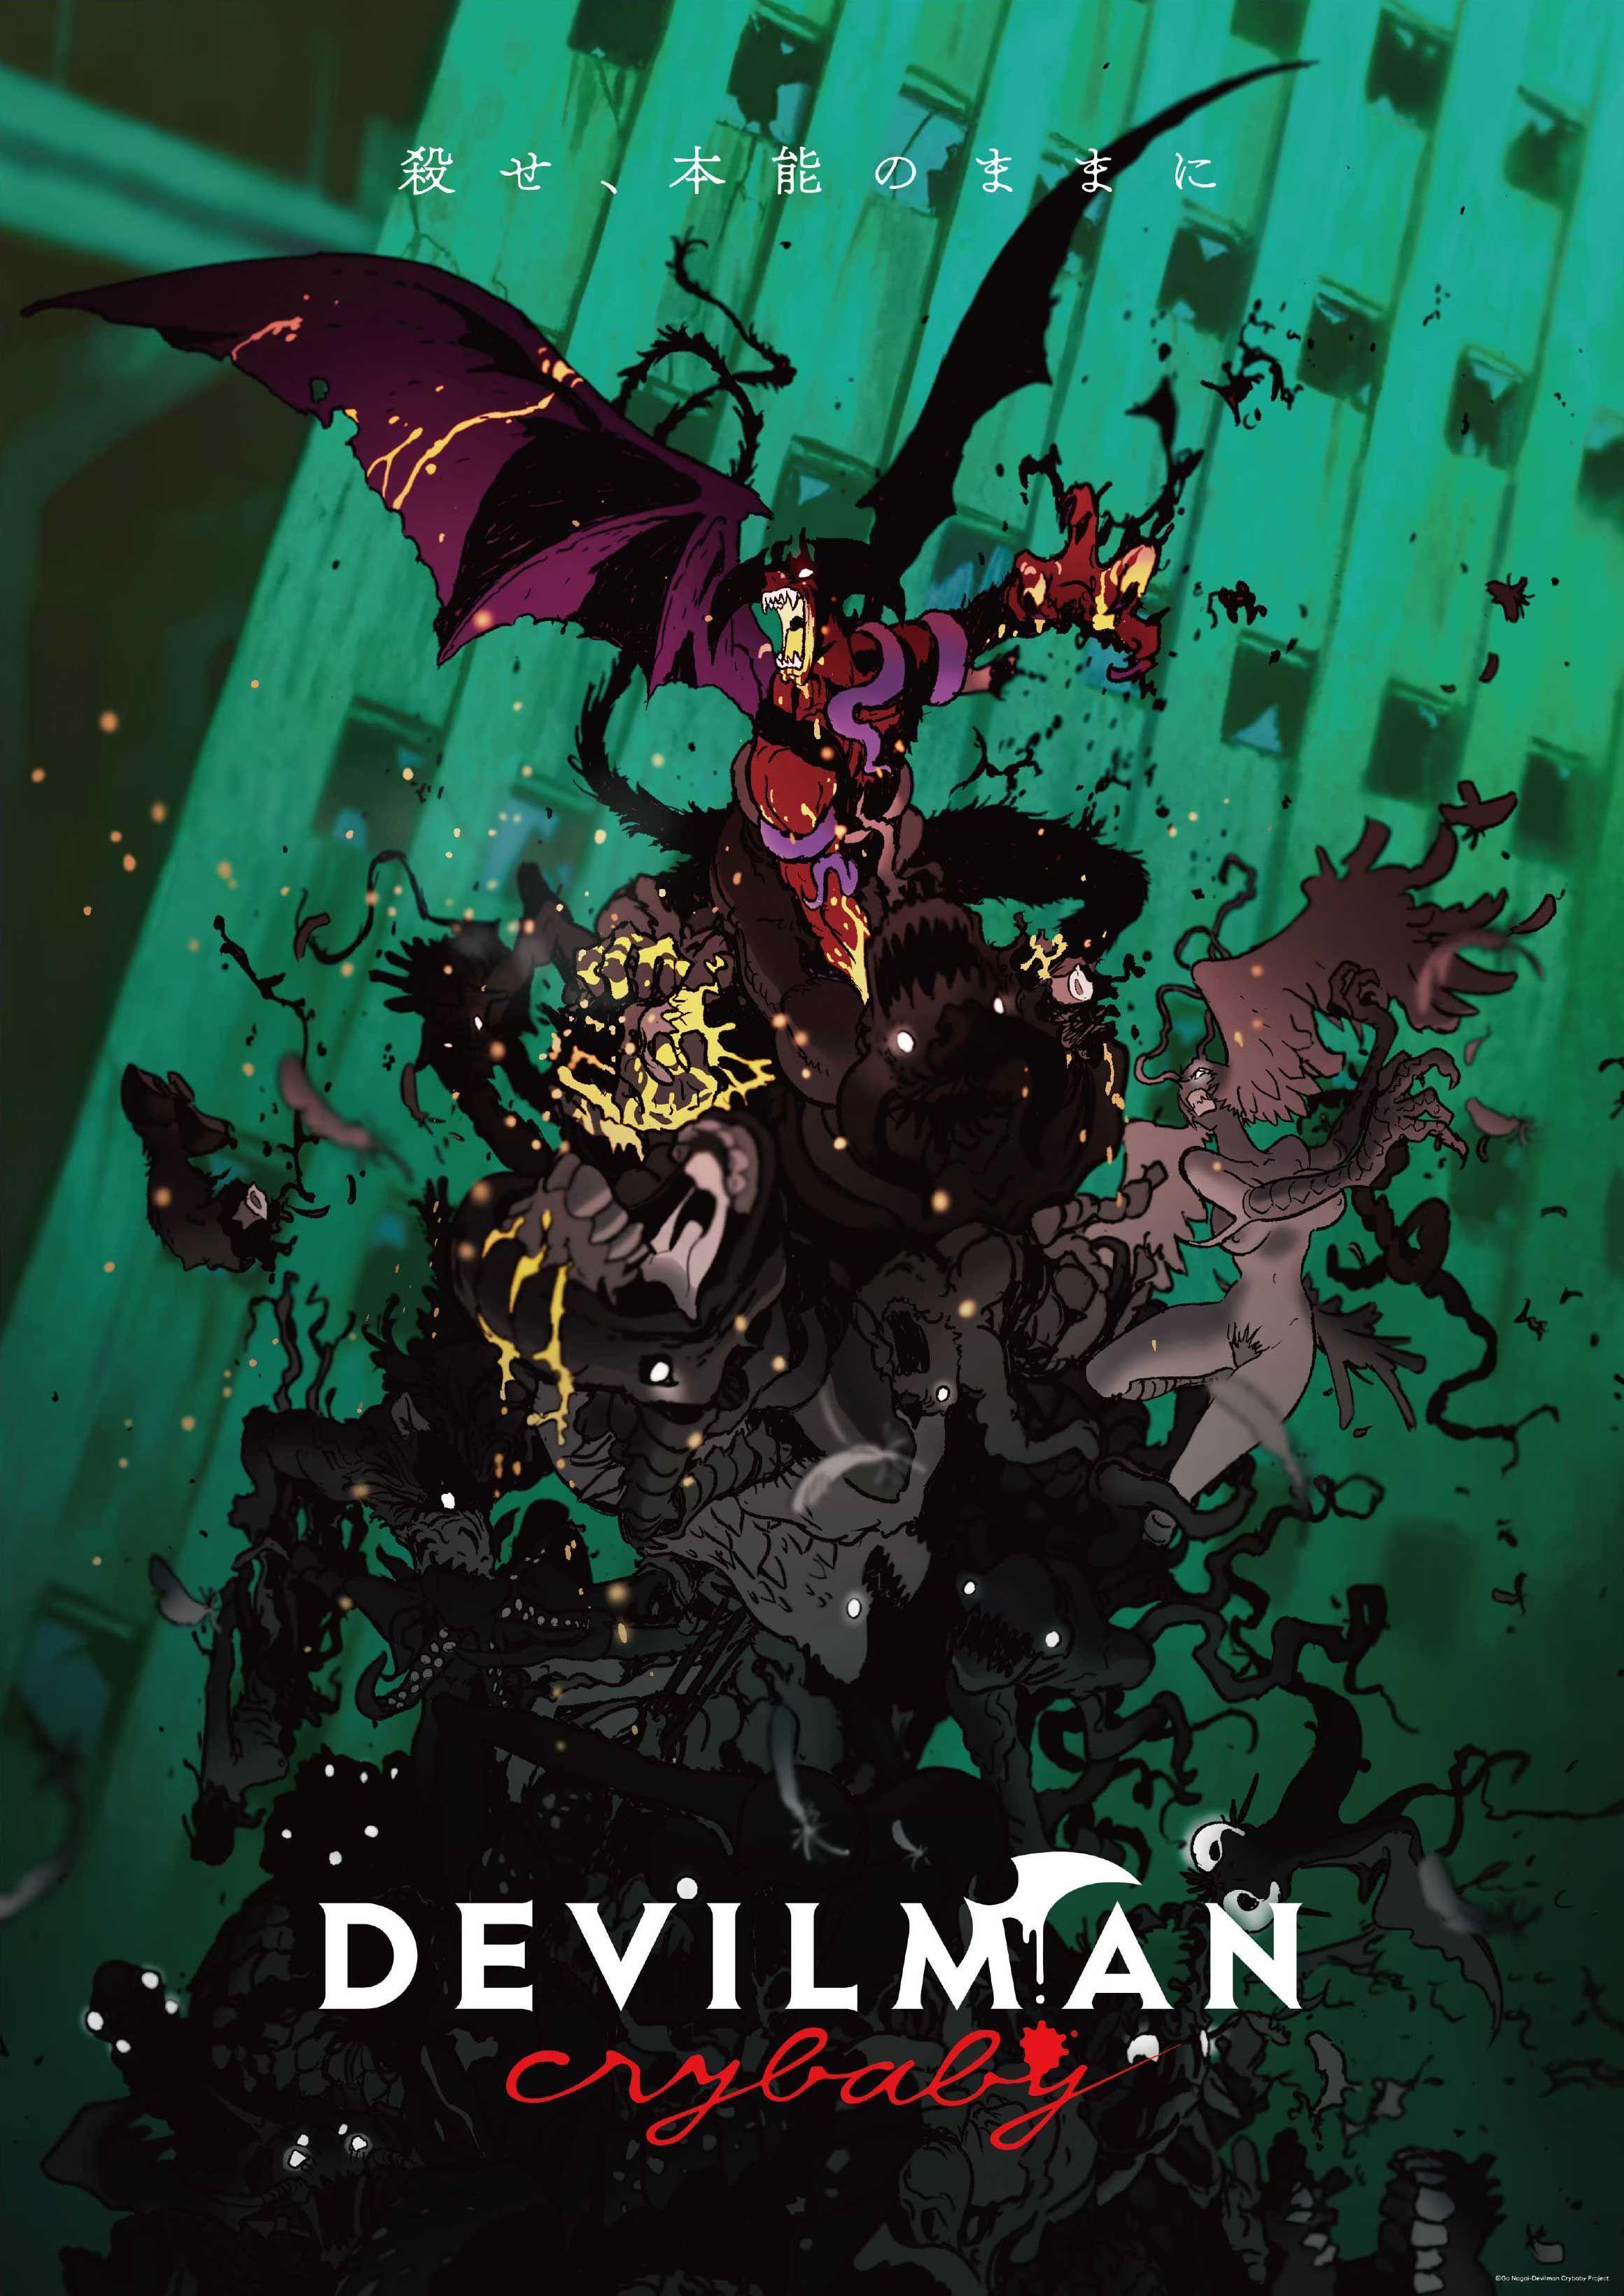 Devilman Crybaby Wallpapers - Wallpaper Cave